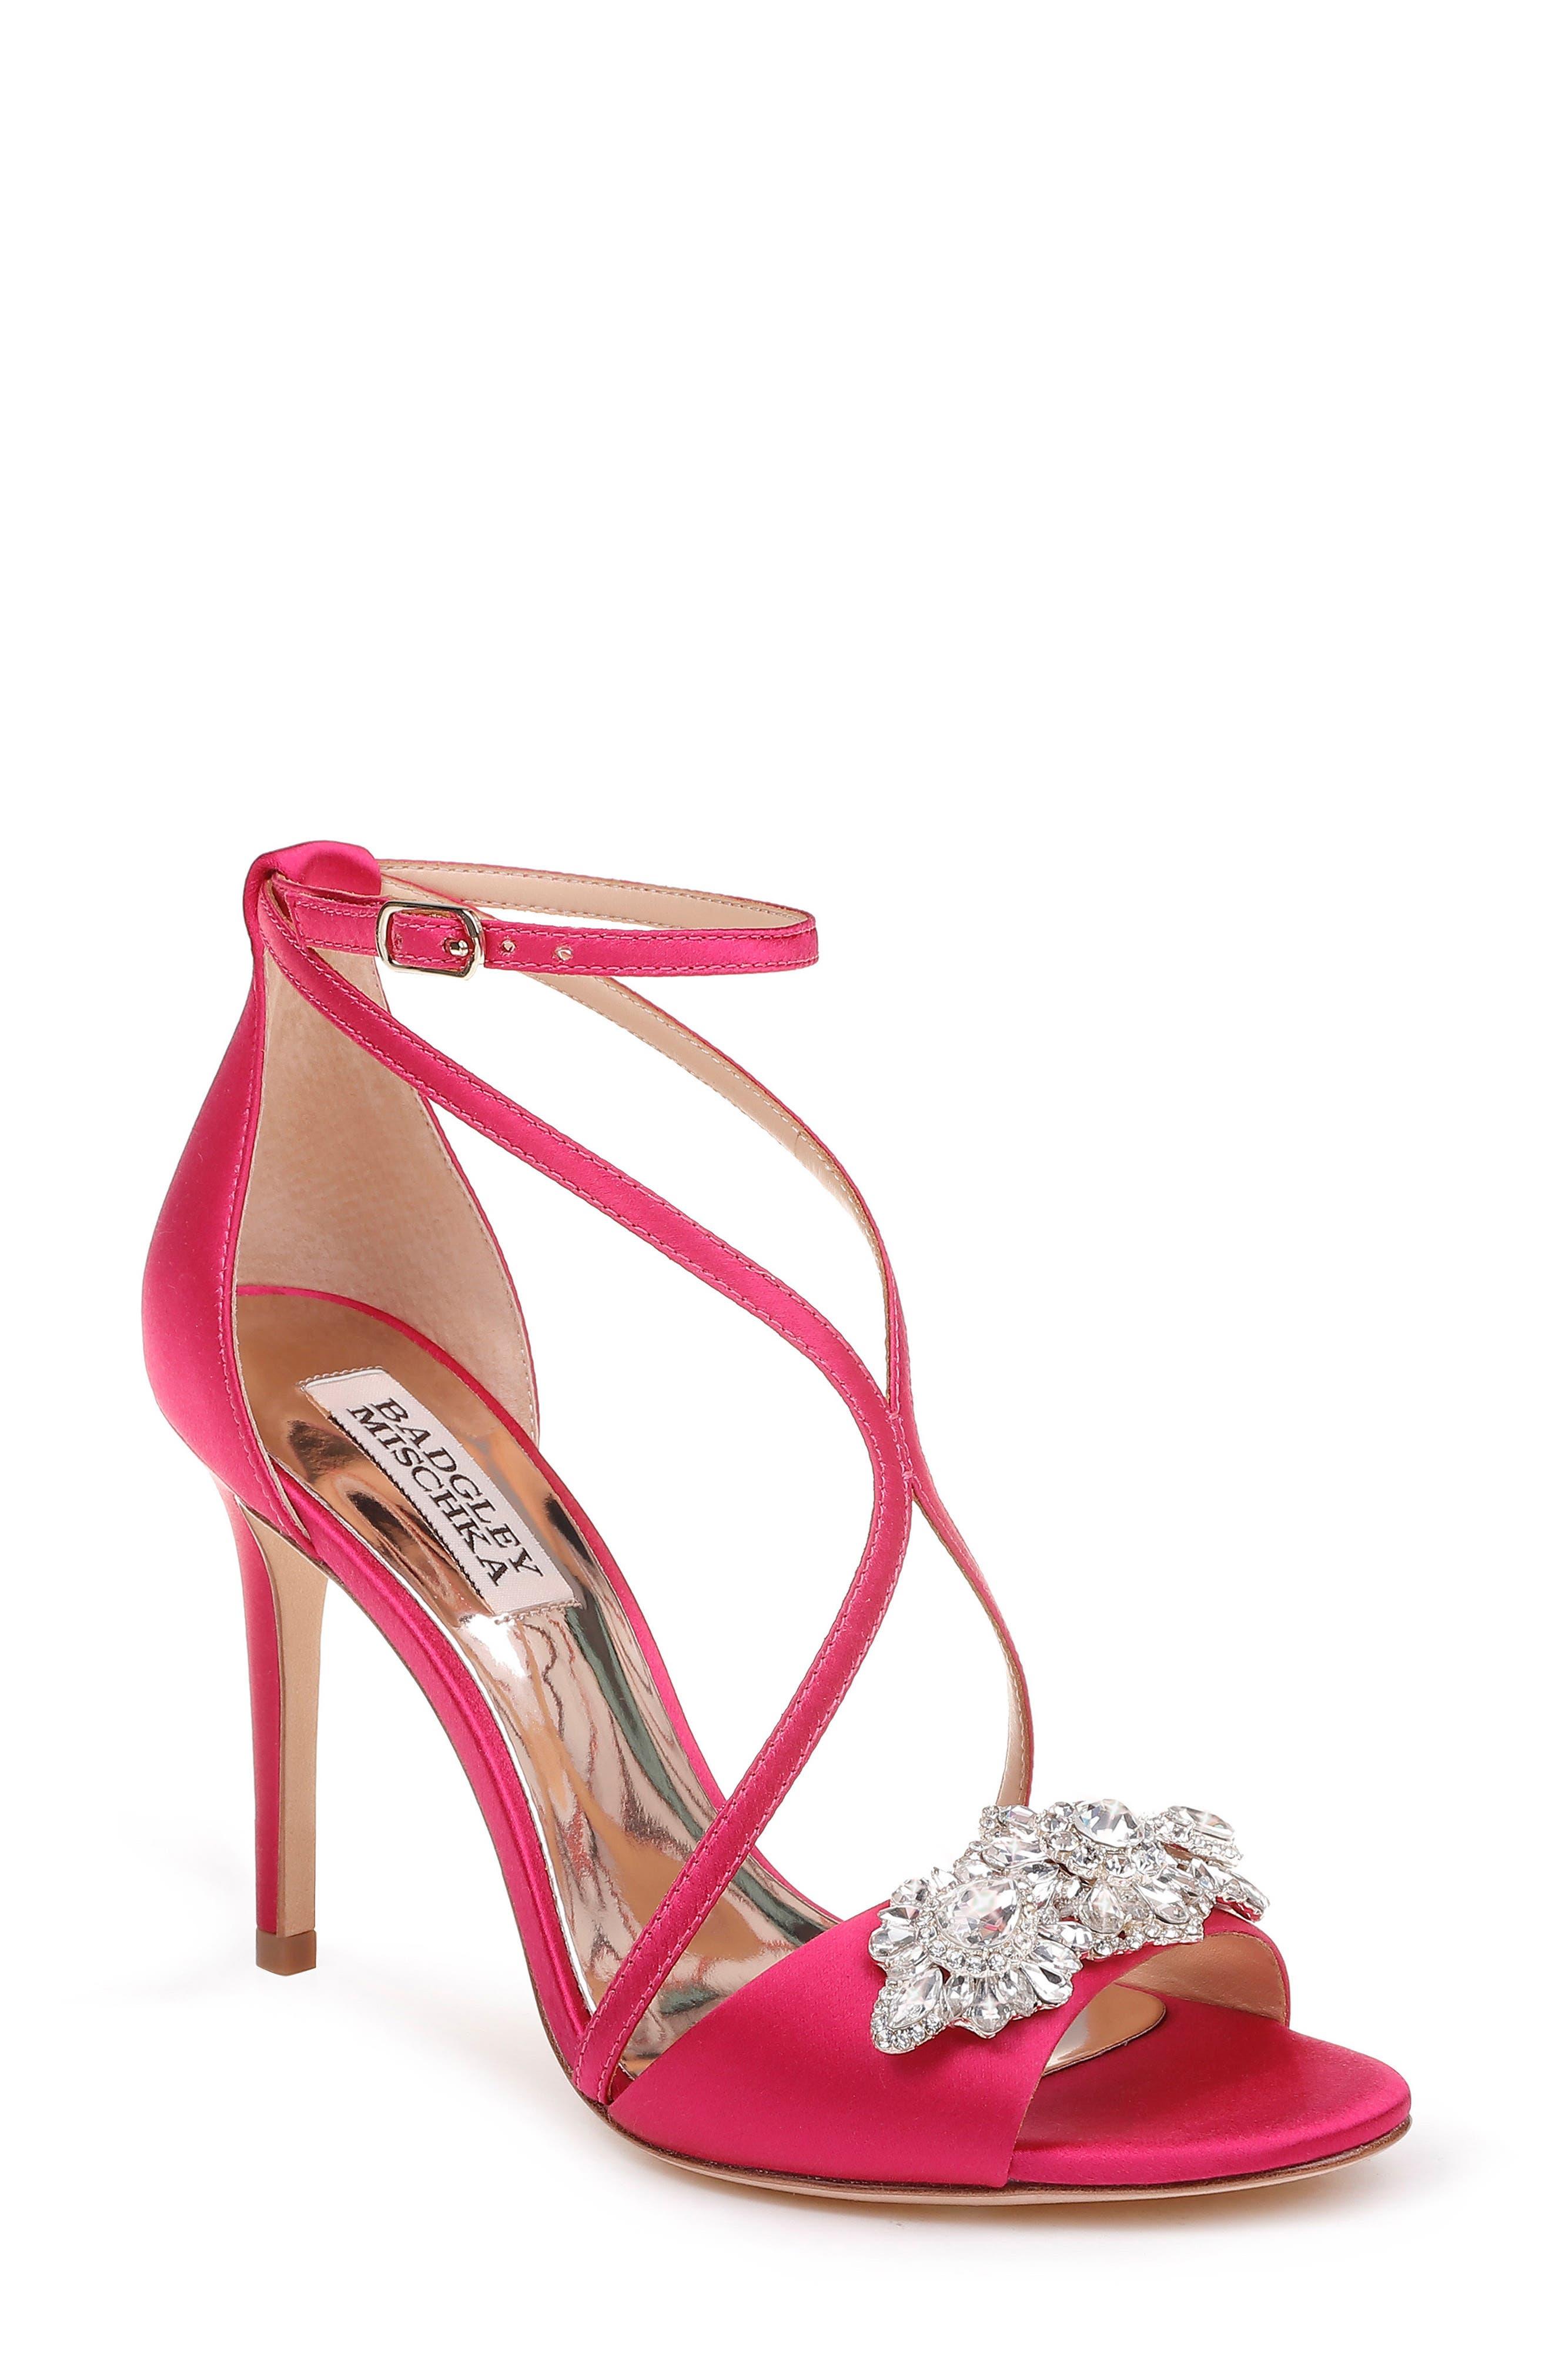 Vanessa Crystal Embellished Sandal,                             Main thumbnail 1, color,                             688